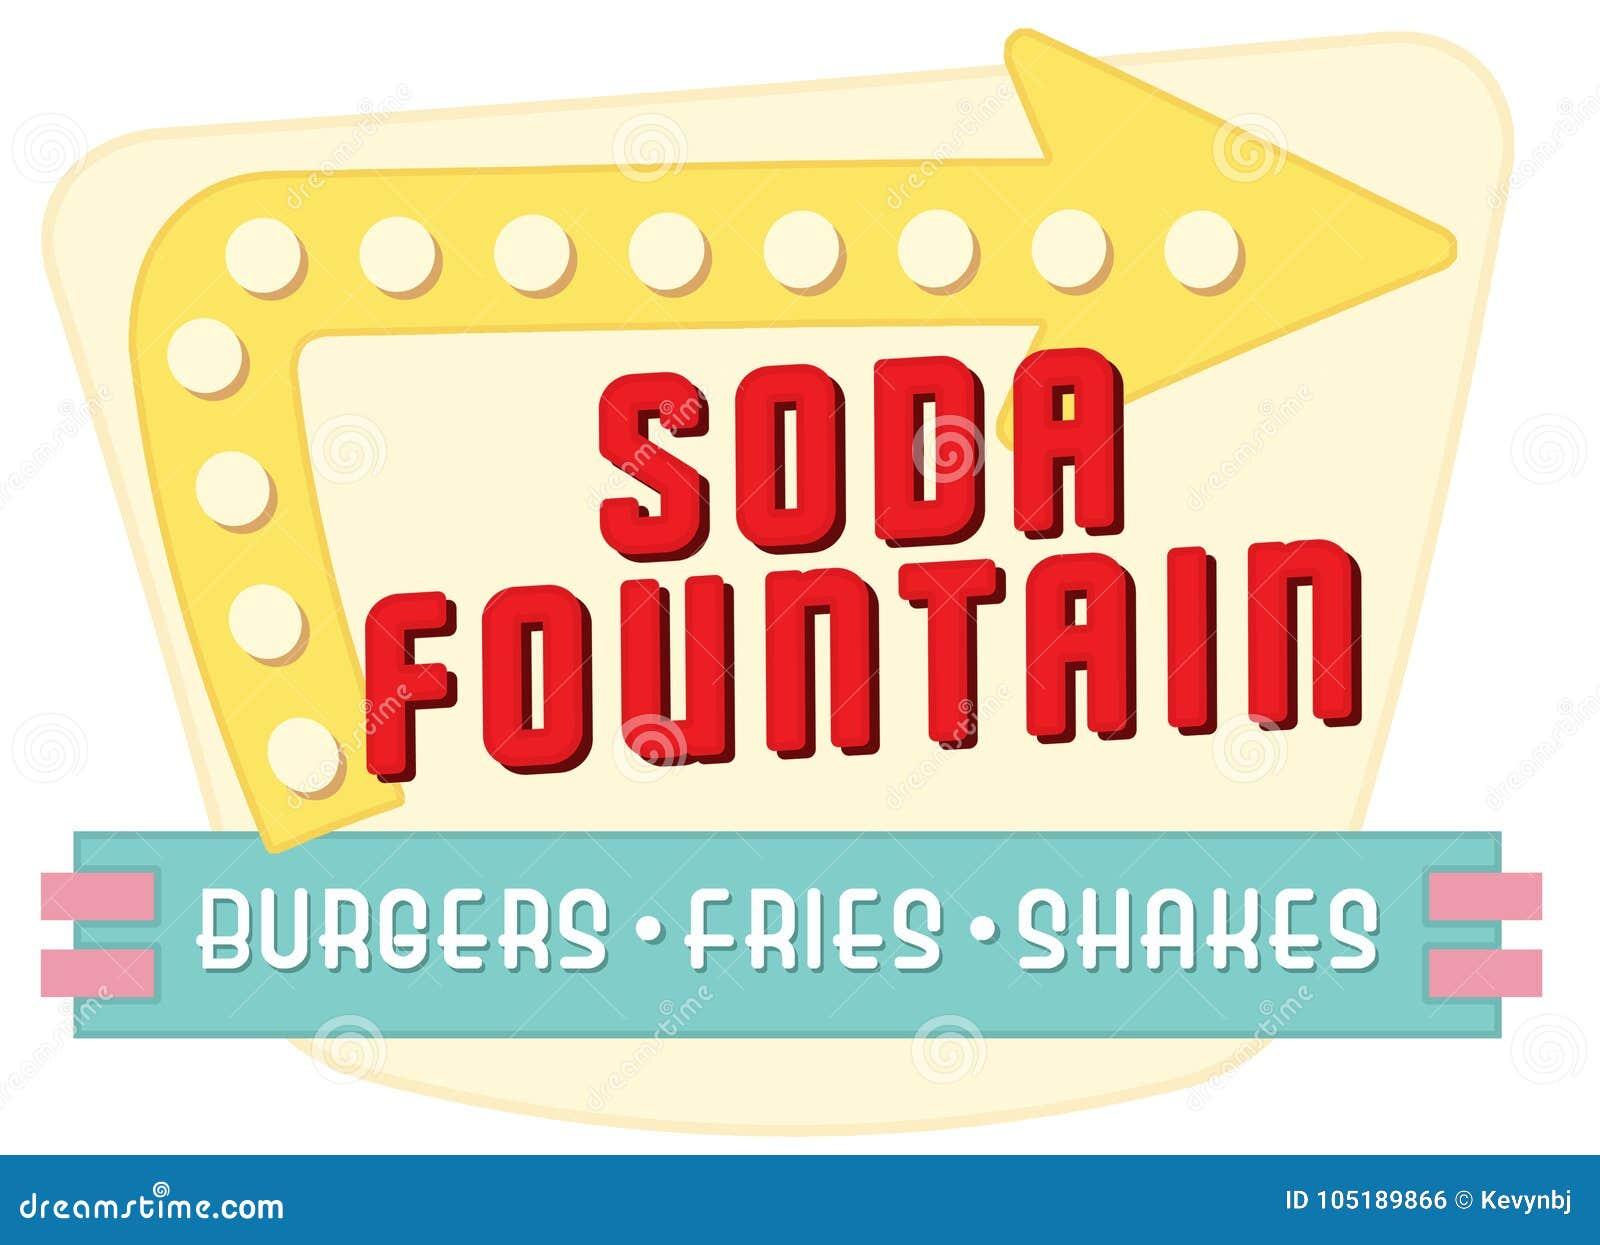 Soda Fountain Diner Sign